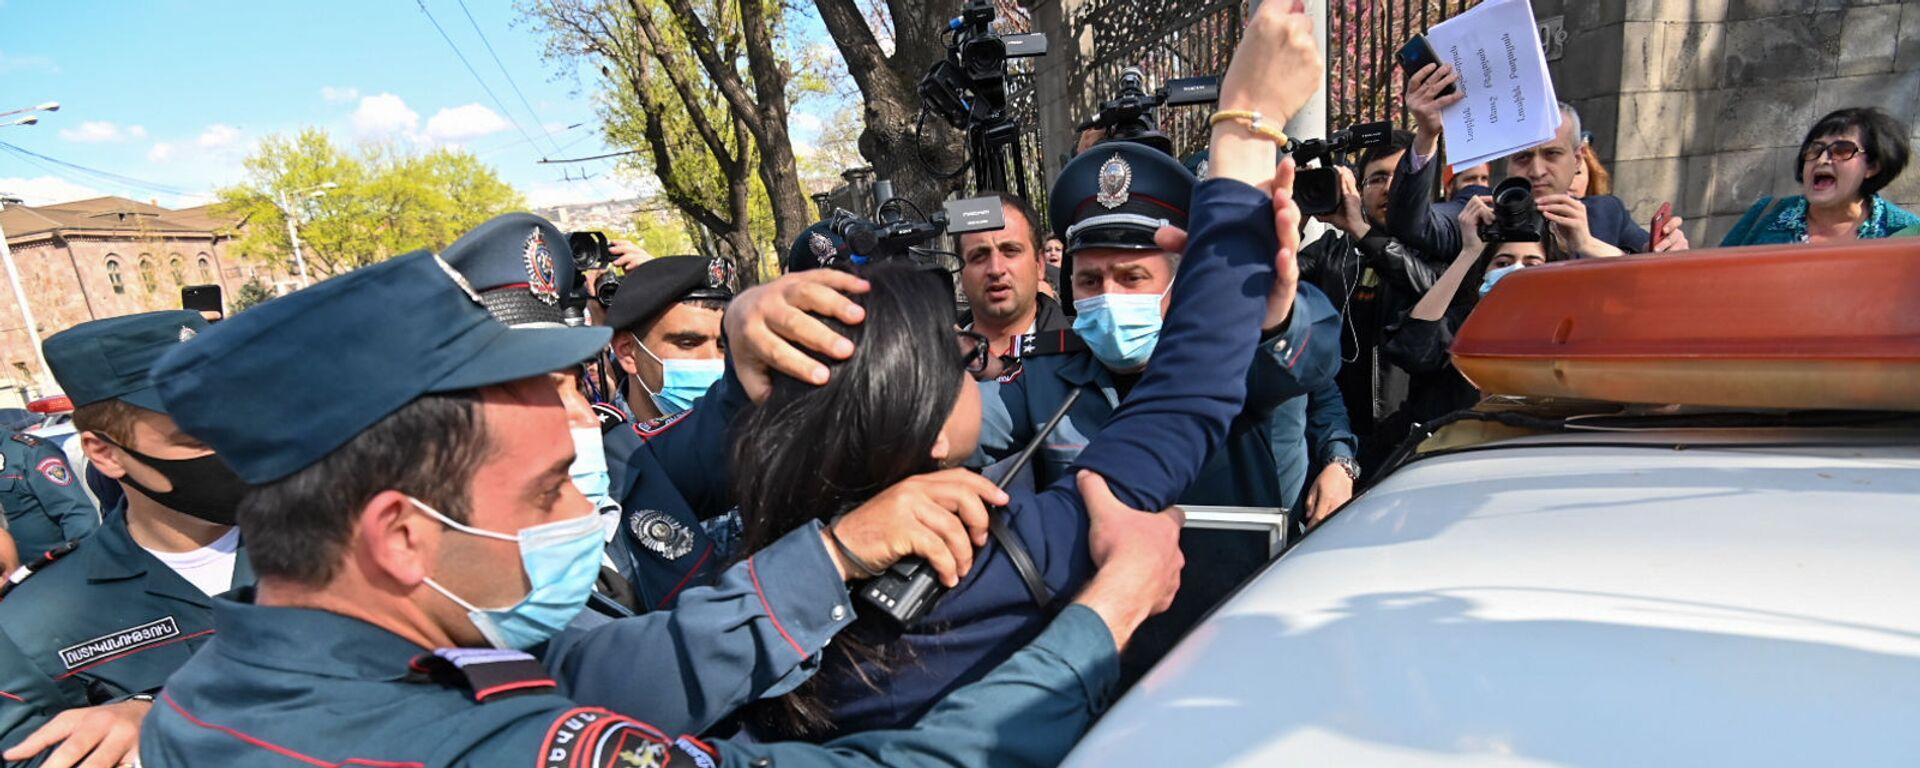 Полиция задерживает участников акции протеста на проспекте Баграмяна (14 апреля 2021). Еревaн - Sputnik Армения, 1920, 23.09.2021